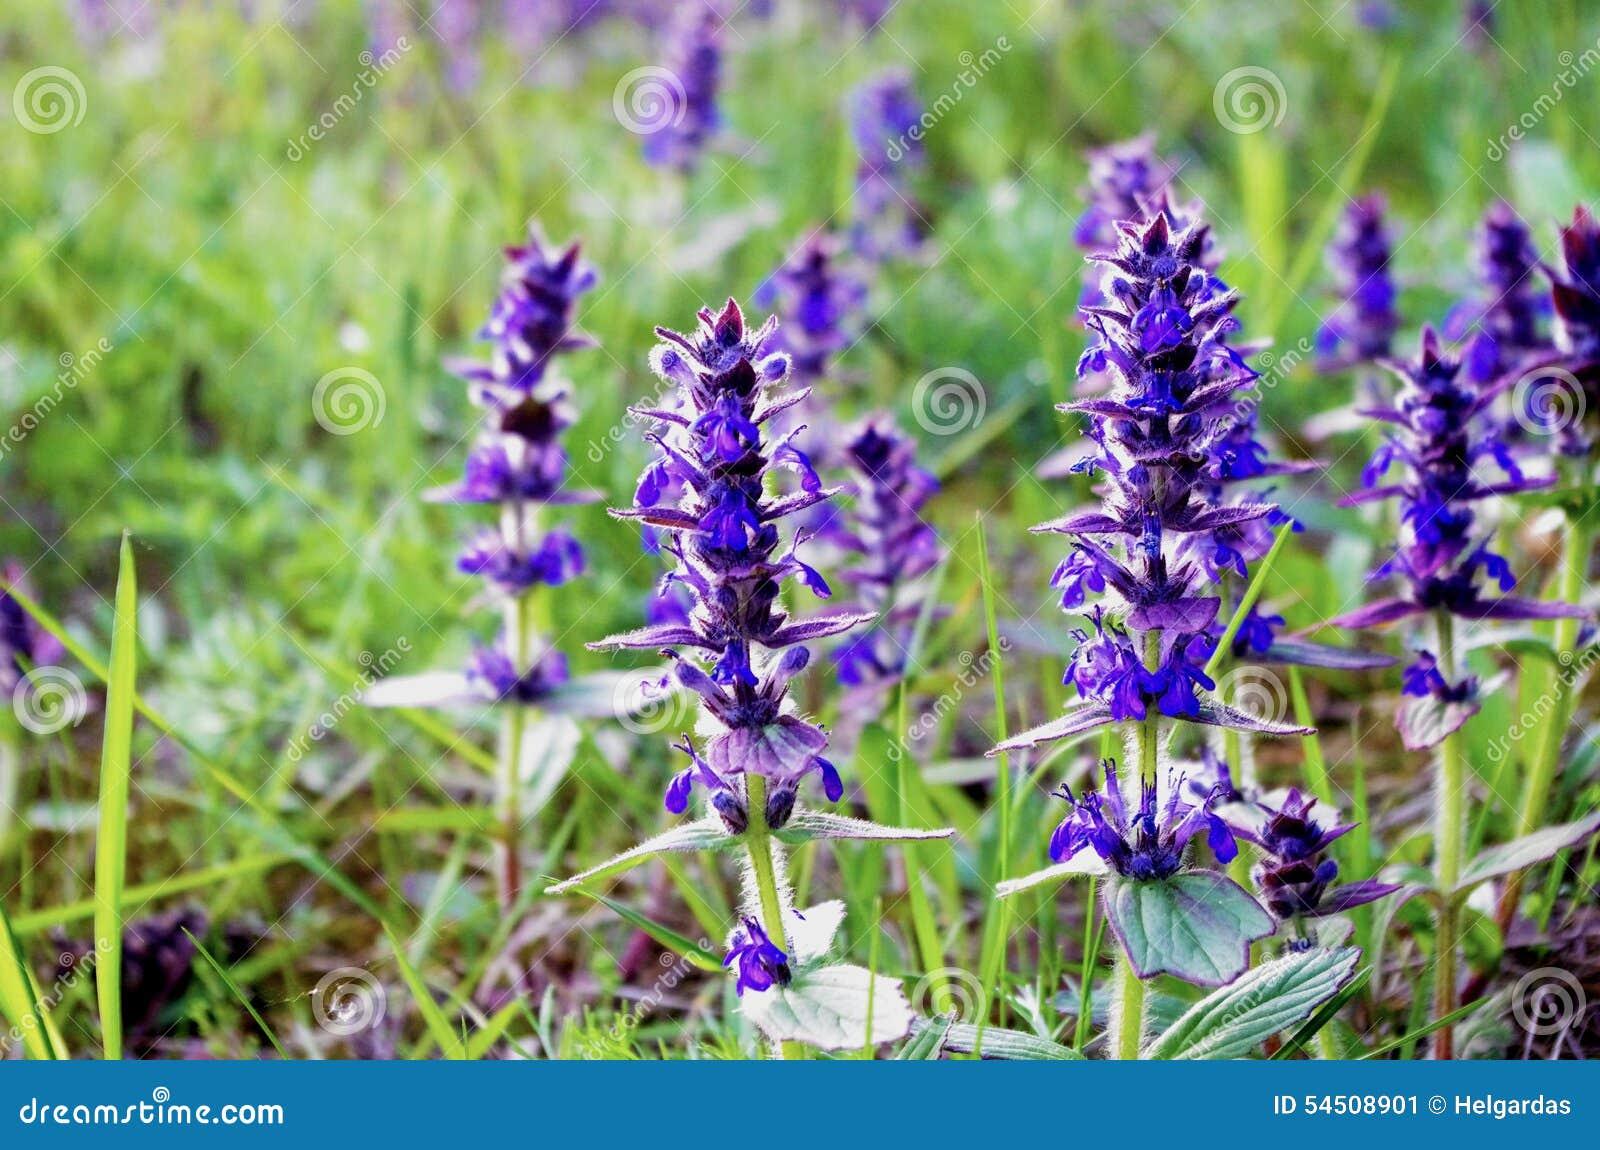 bleu fleurs ressort violet sauvage